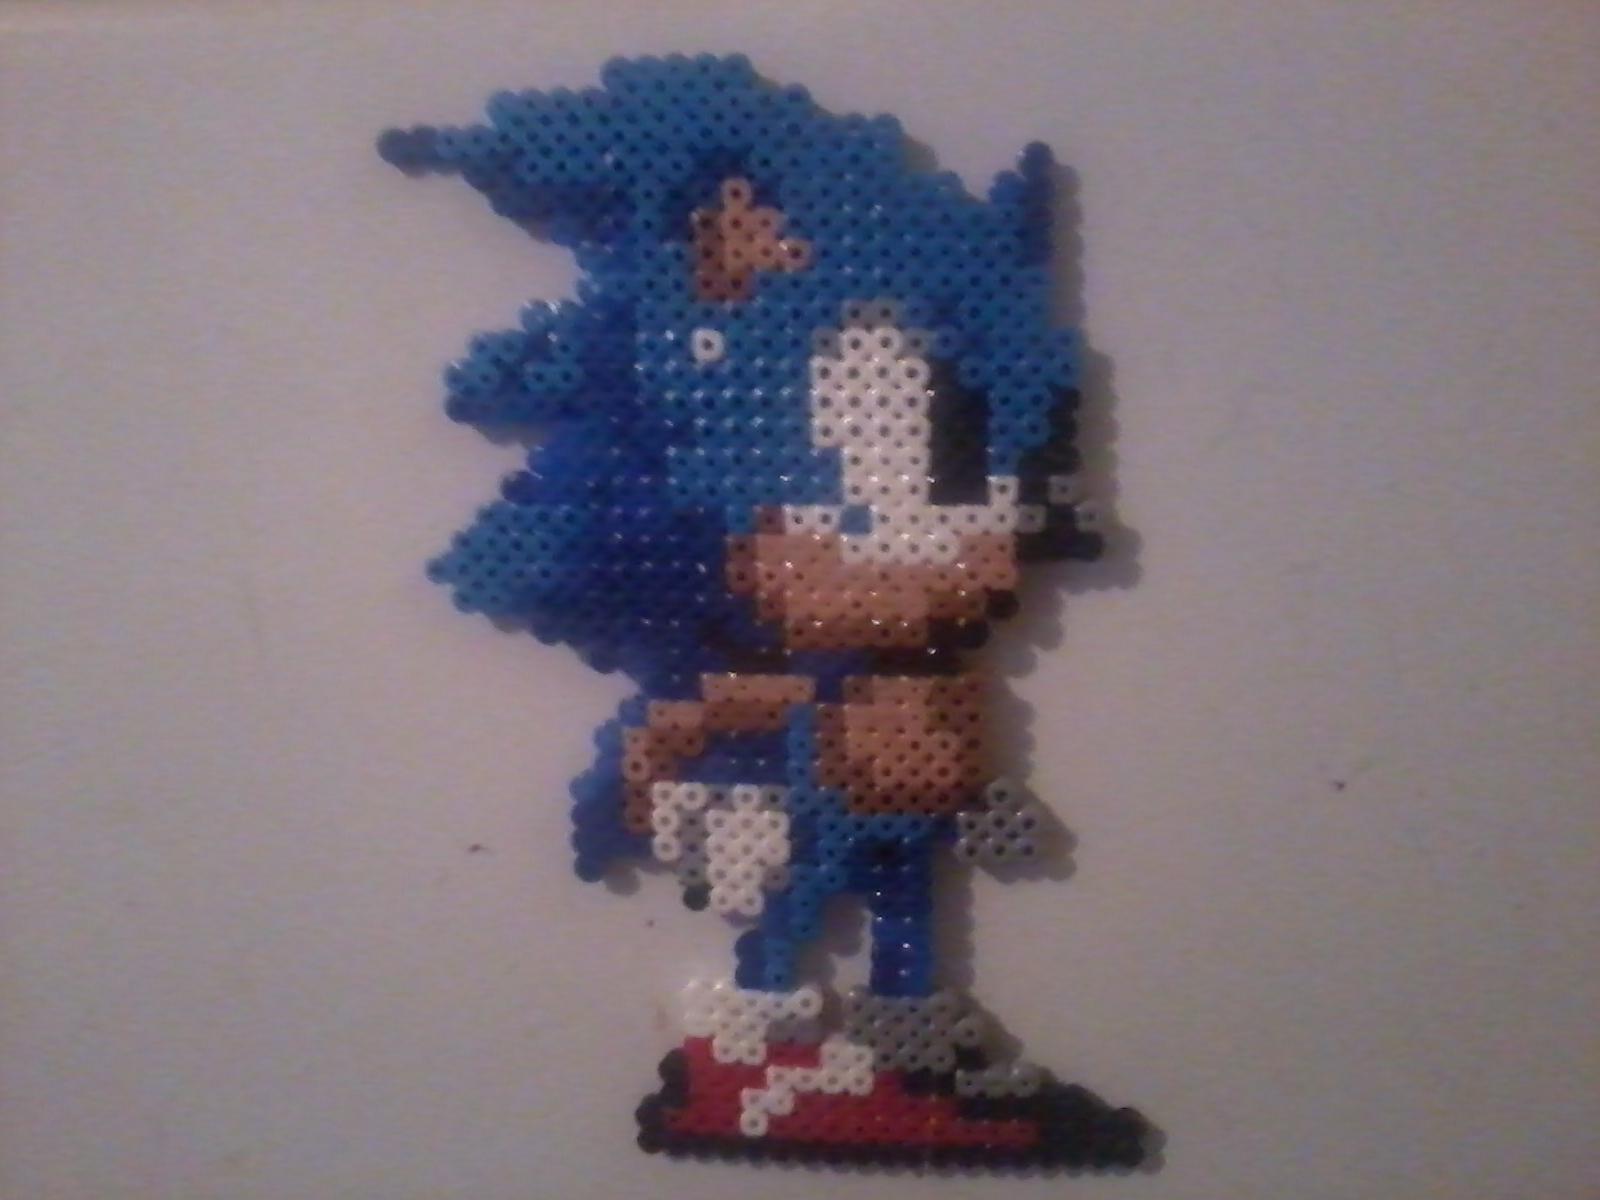 Sonic the Beadhog